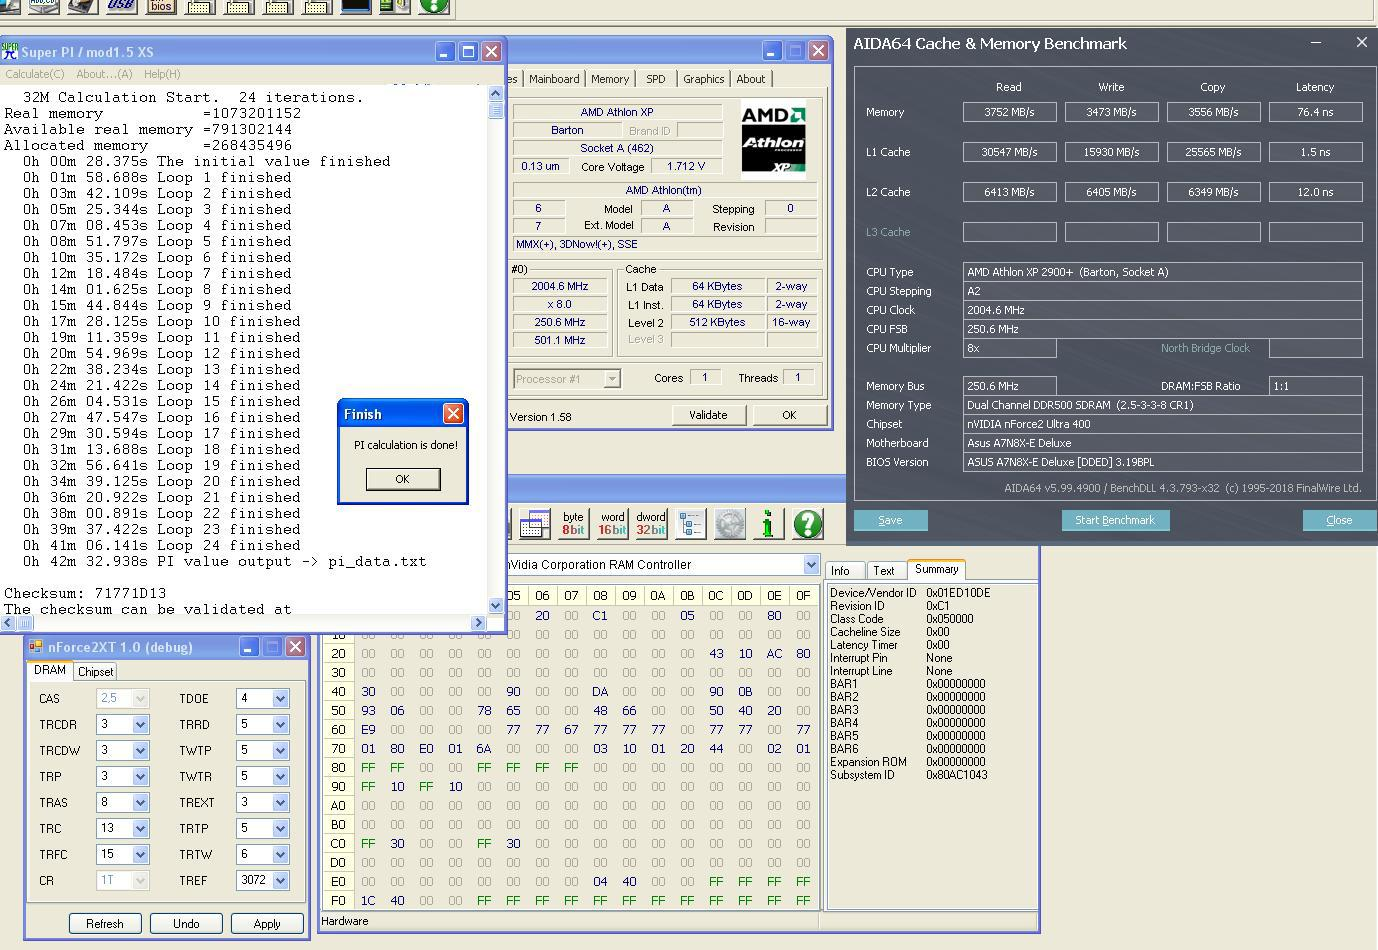 a7n8x-e_tccd_250drjh5.jpg